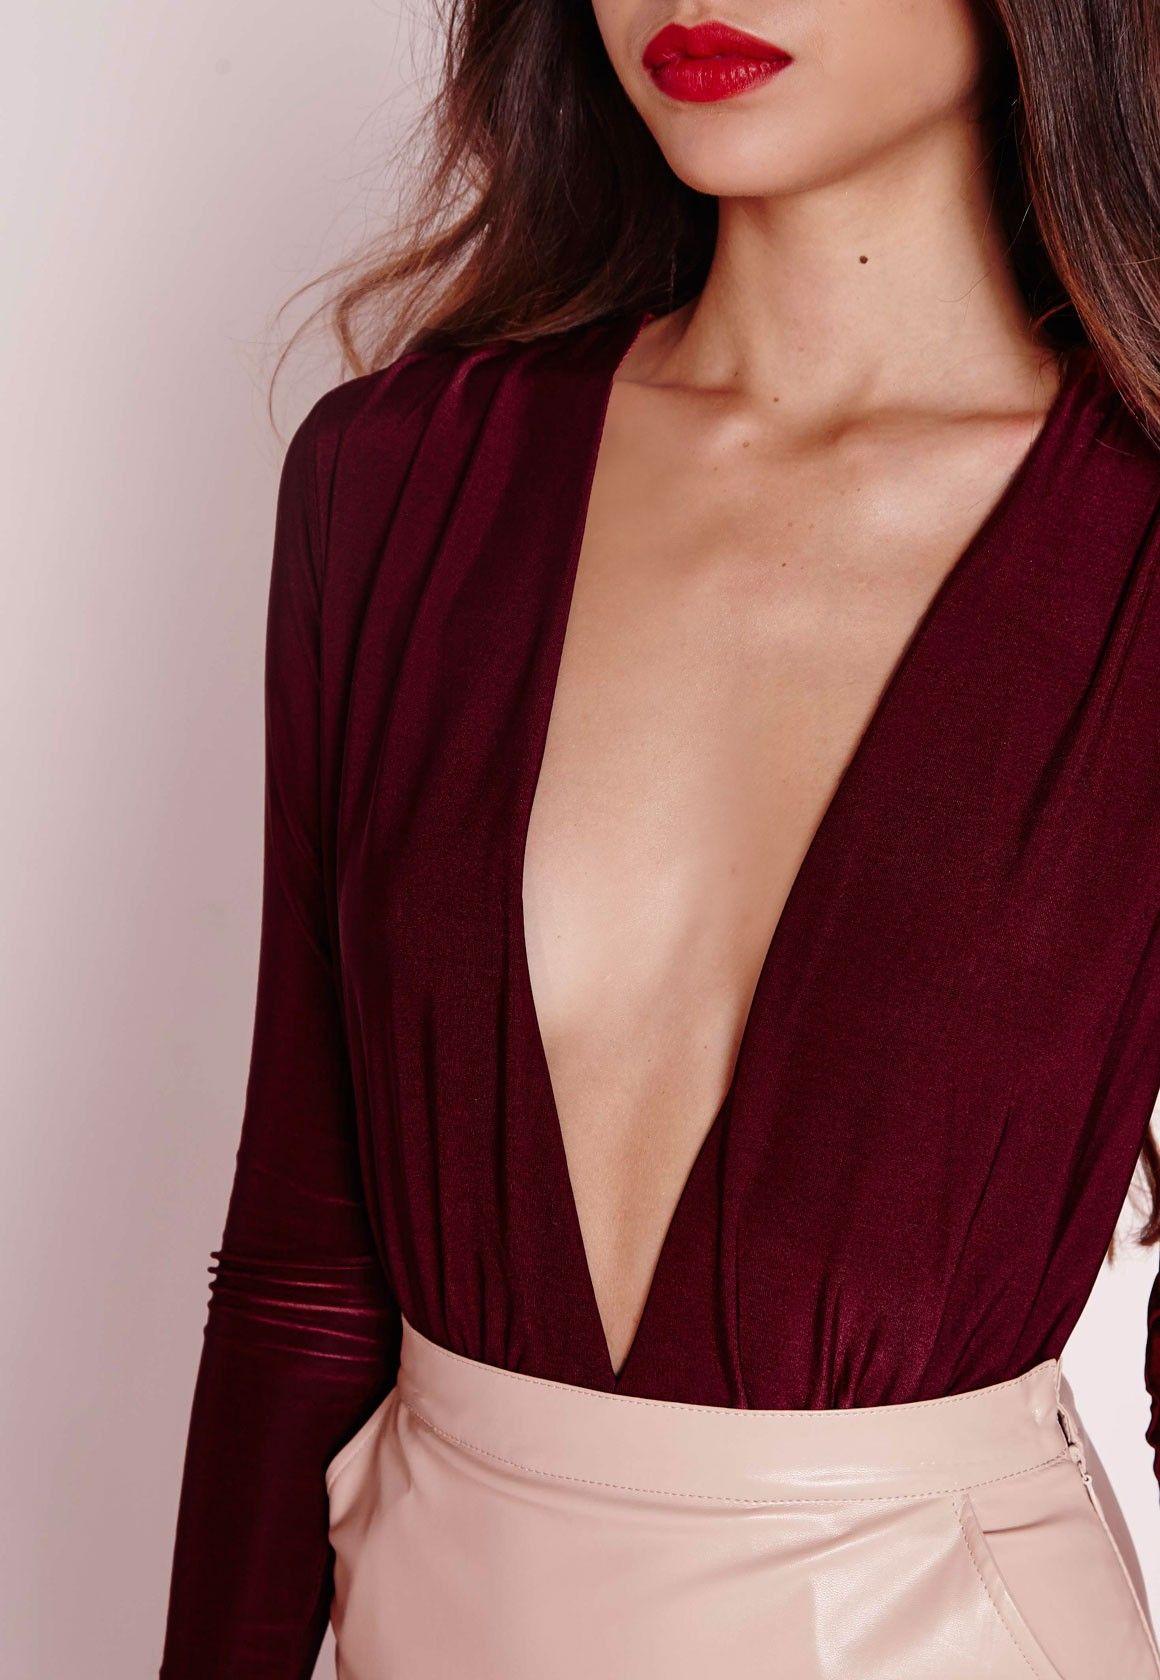 Missguided Slinky Deep Plunge Bodysuit Burgundy Plunging Neckline Outfits Low Plunge Dress Necklines For Dresses [ 1680 x 1160 Pixel ]